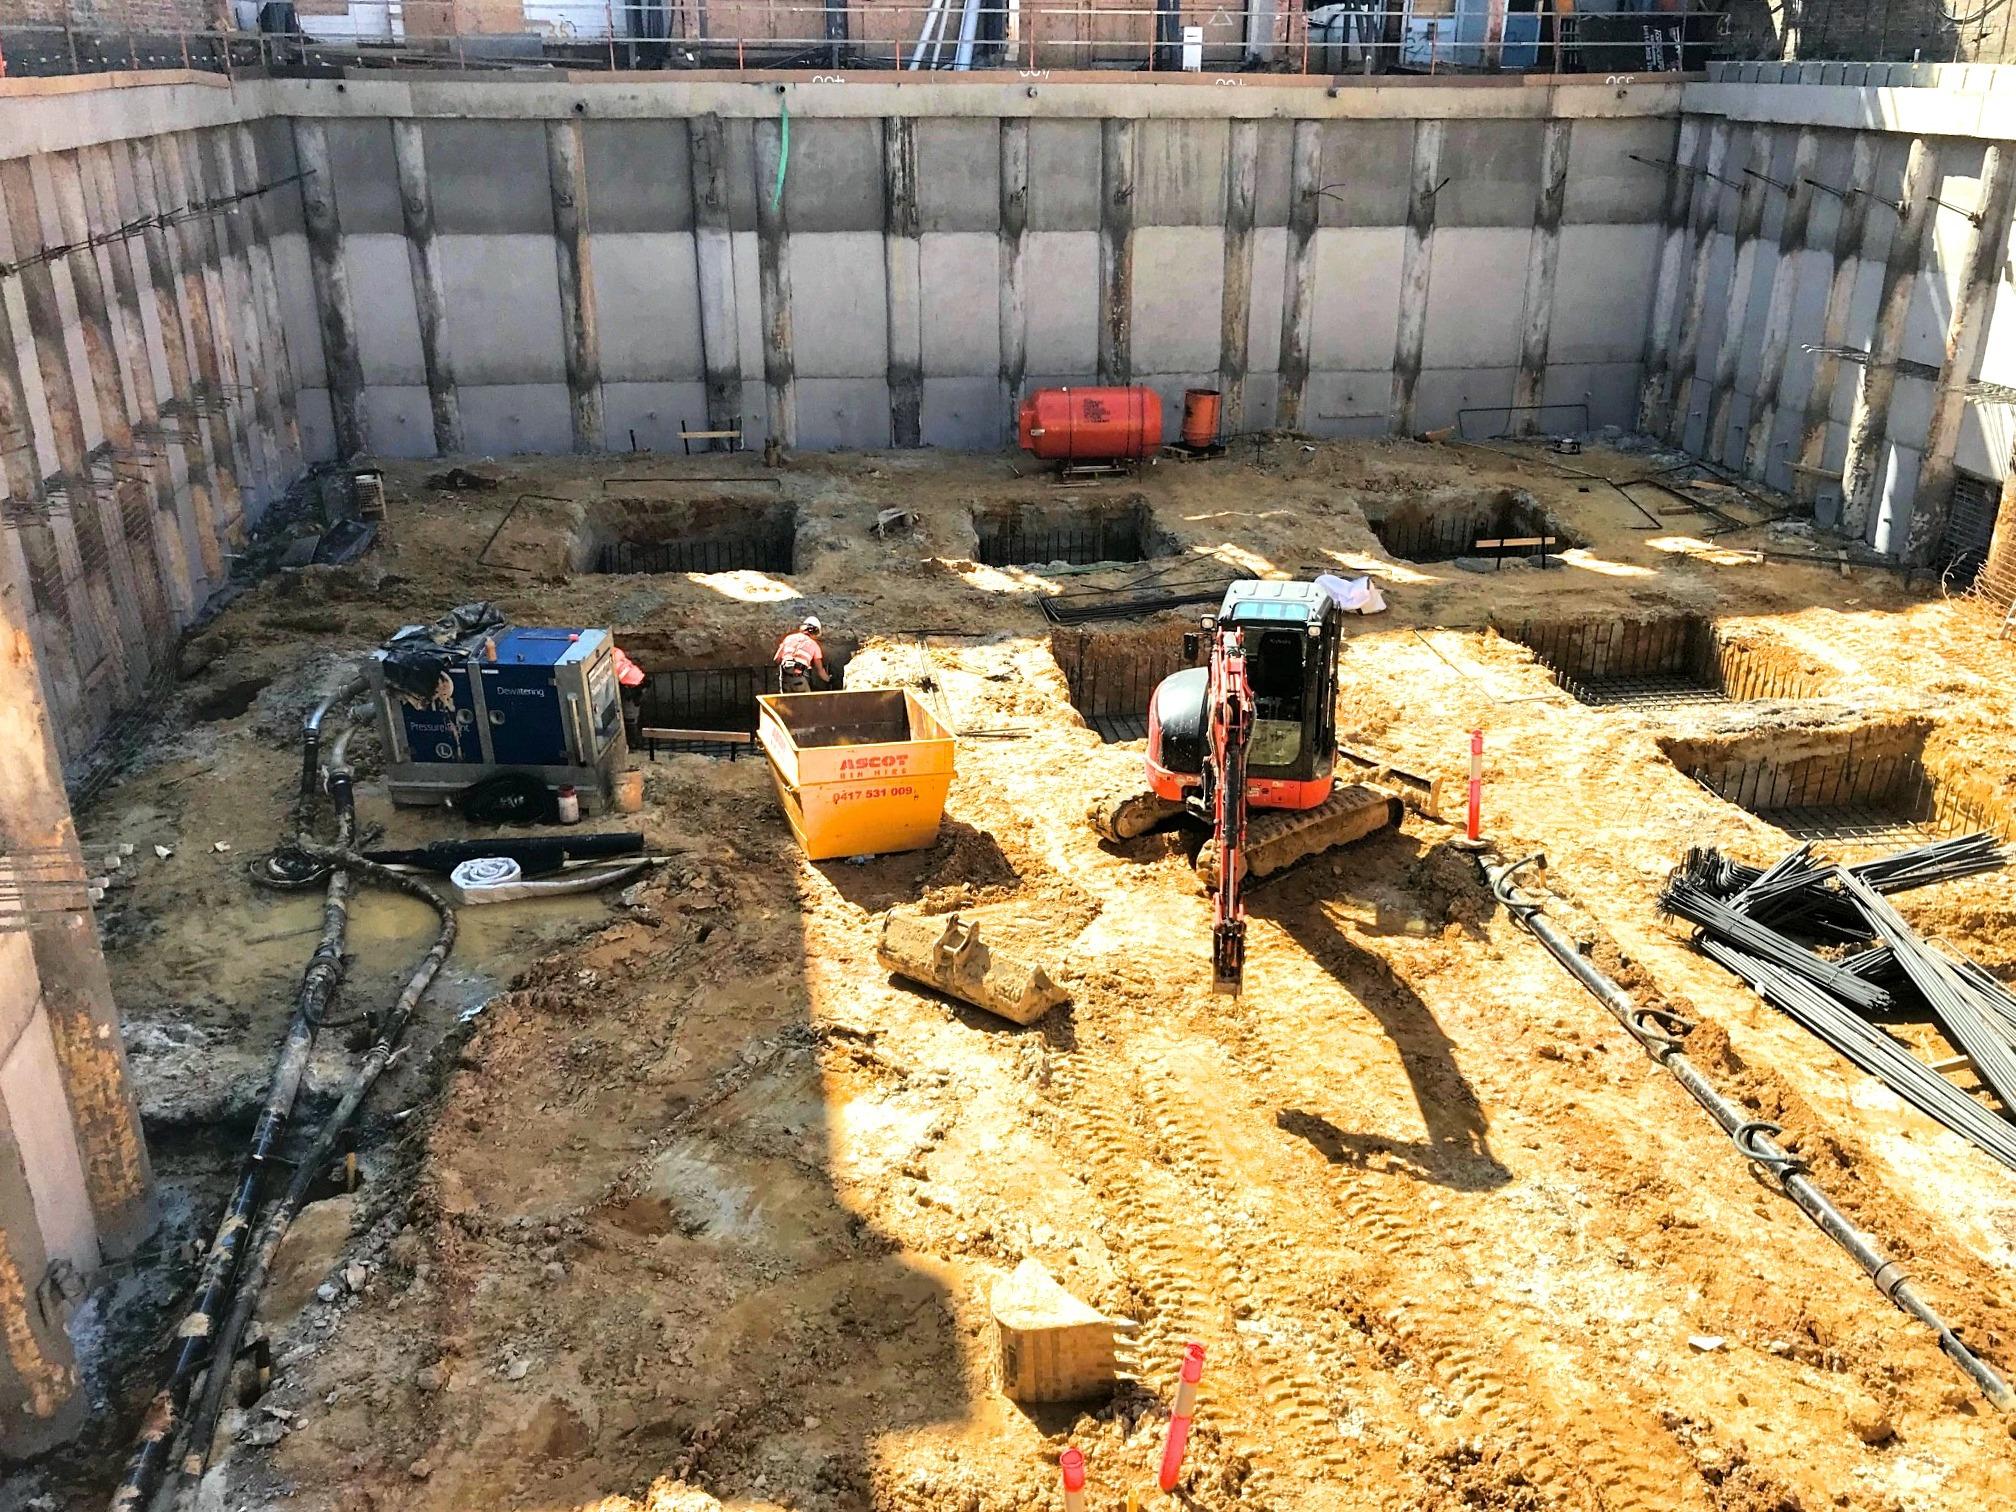 Windsor Terrace excavation basement works 01.jpg